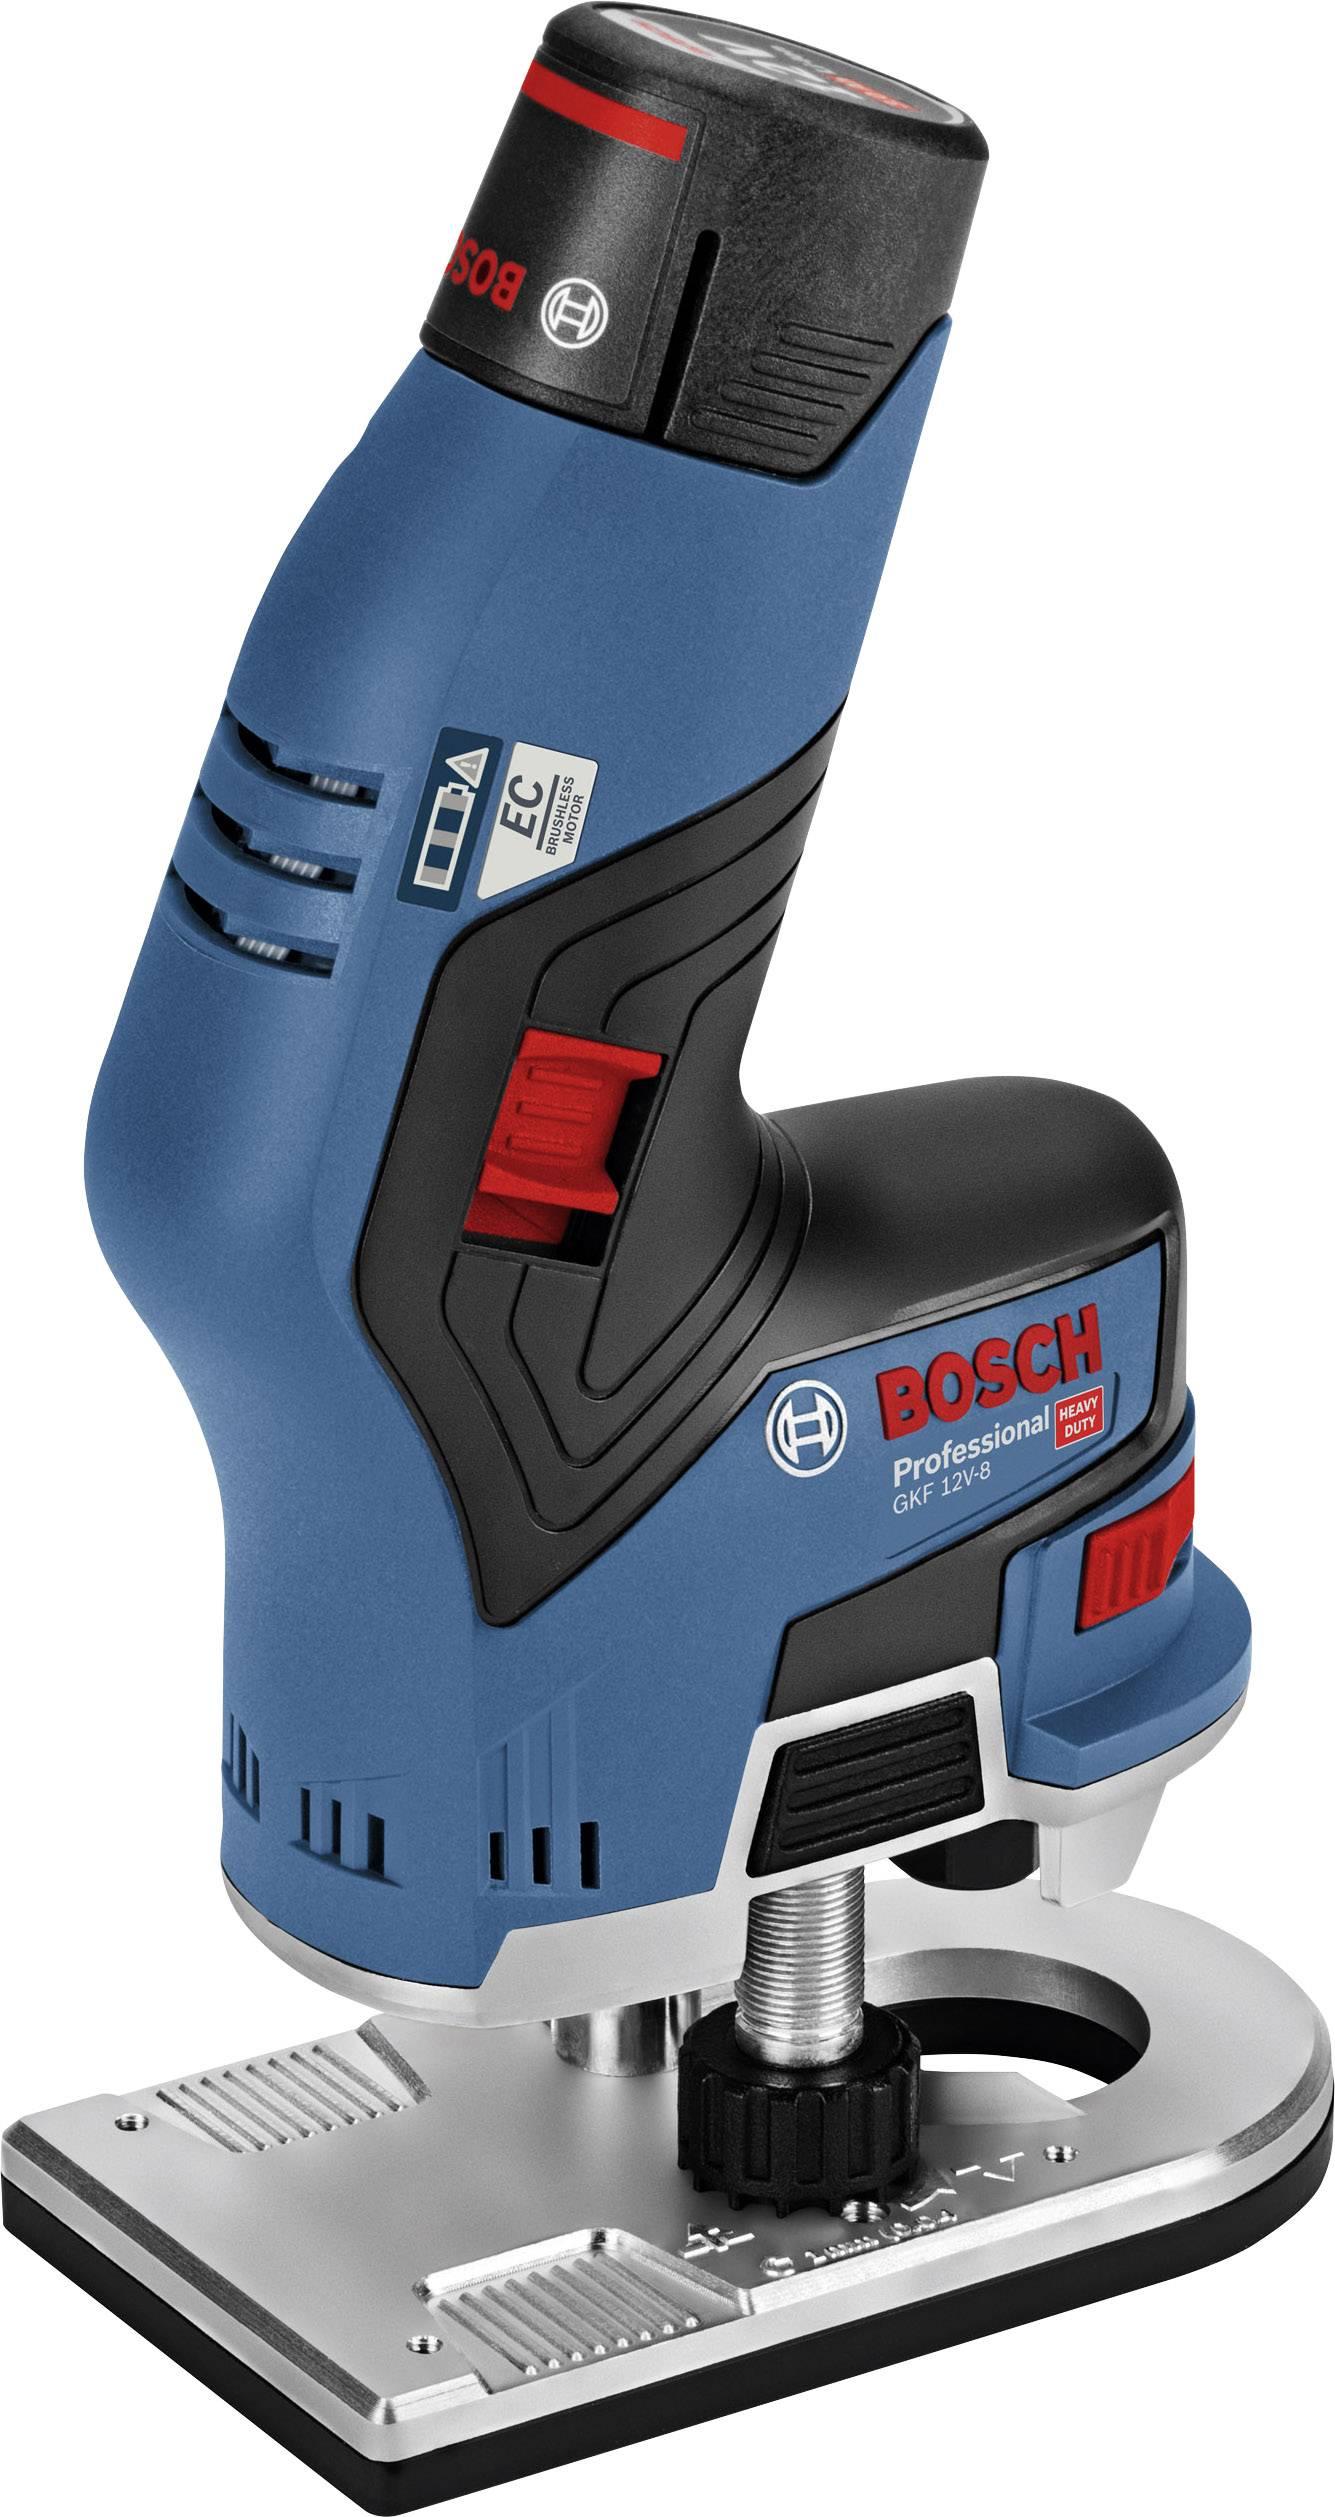 Bosch Professional Gkf 12v 8 Cordless Palm Router 06016b0000 Gkf 12v 8 Incl Spare Battery Incl Case Conrad Com